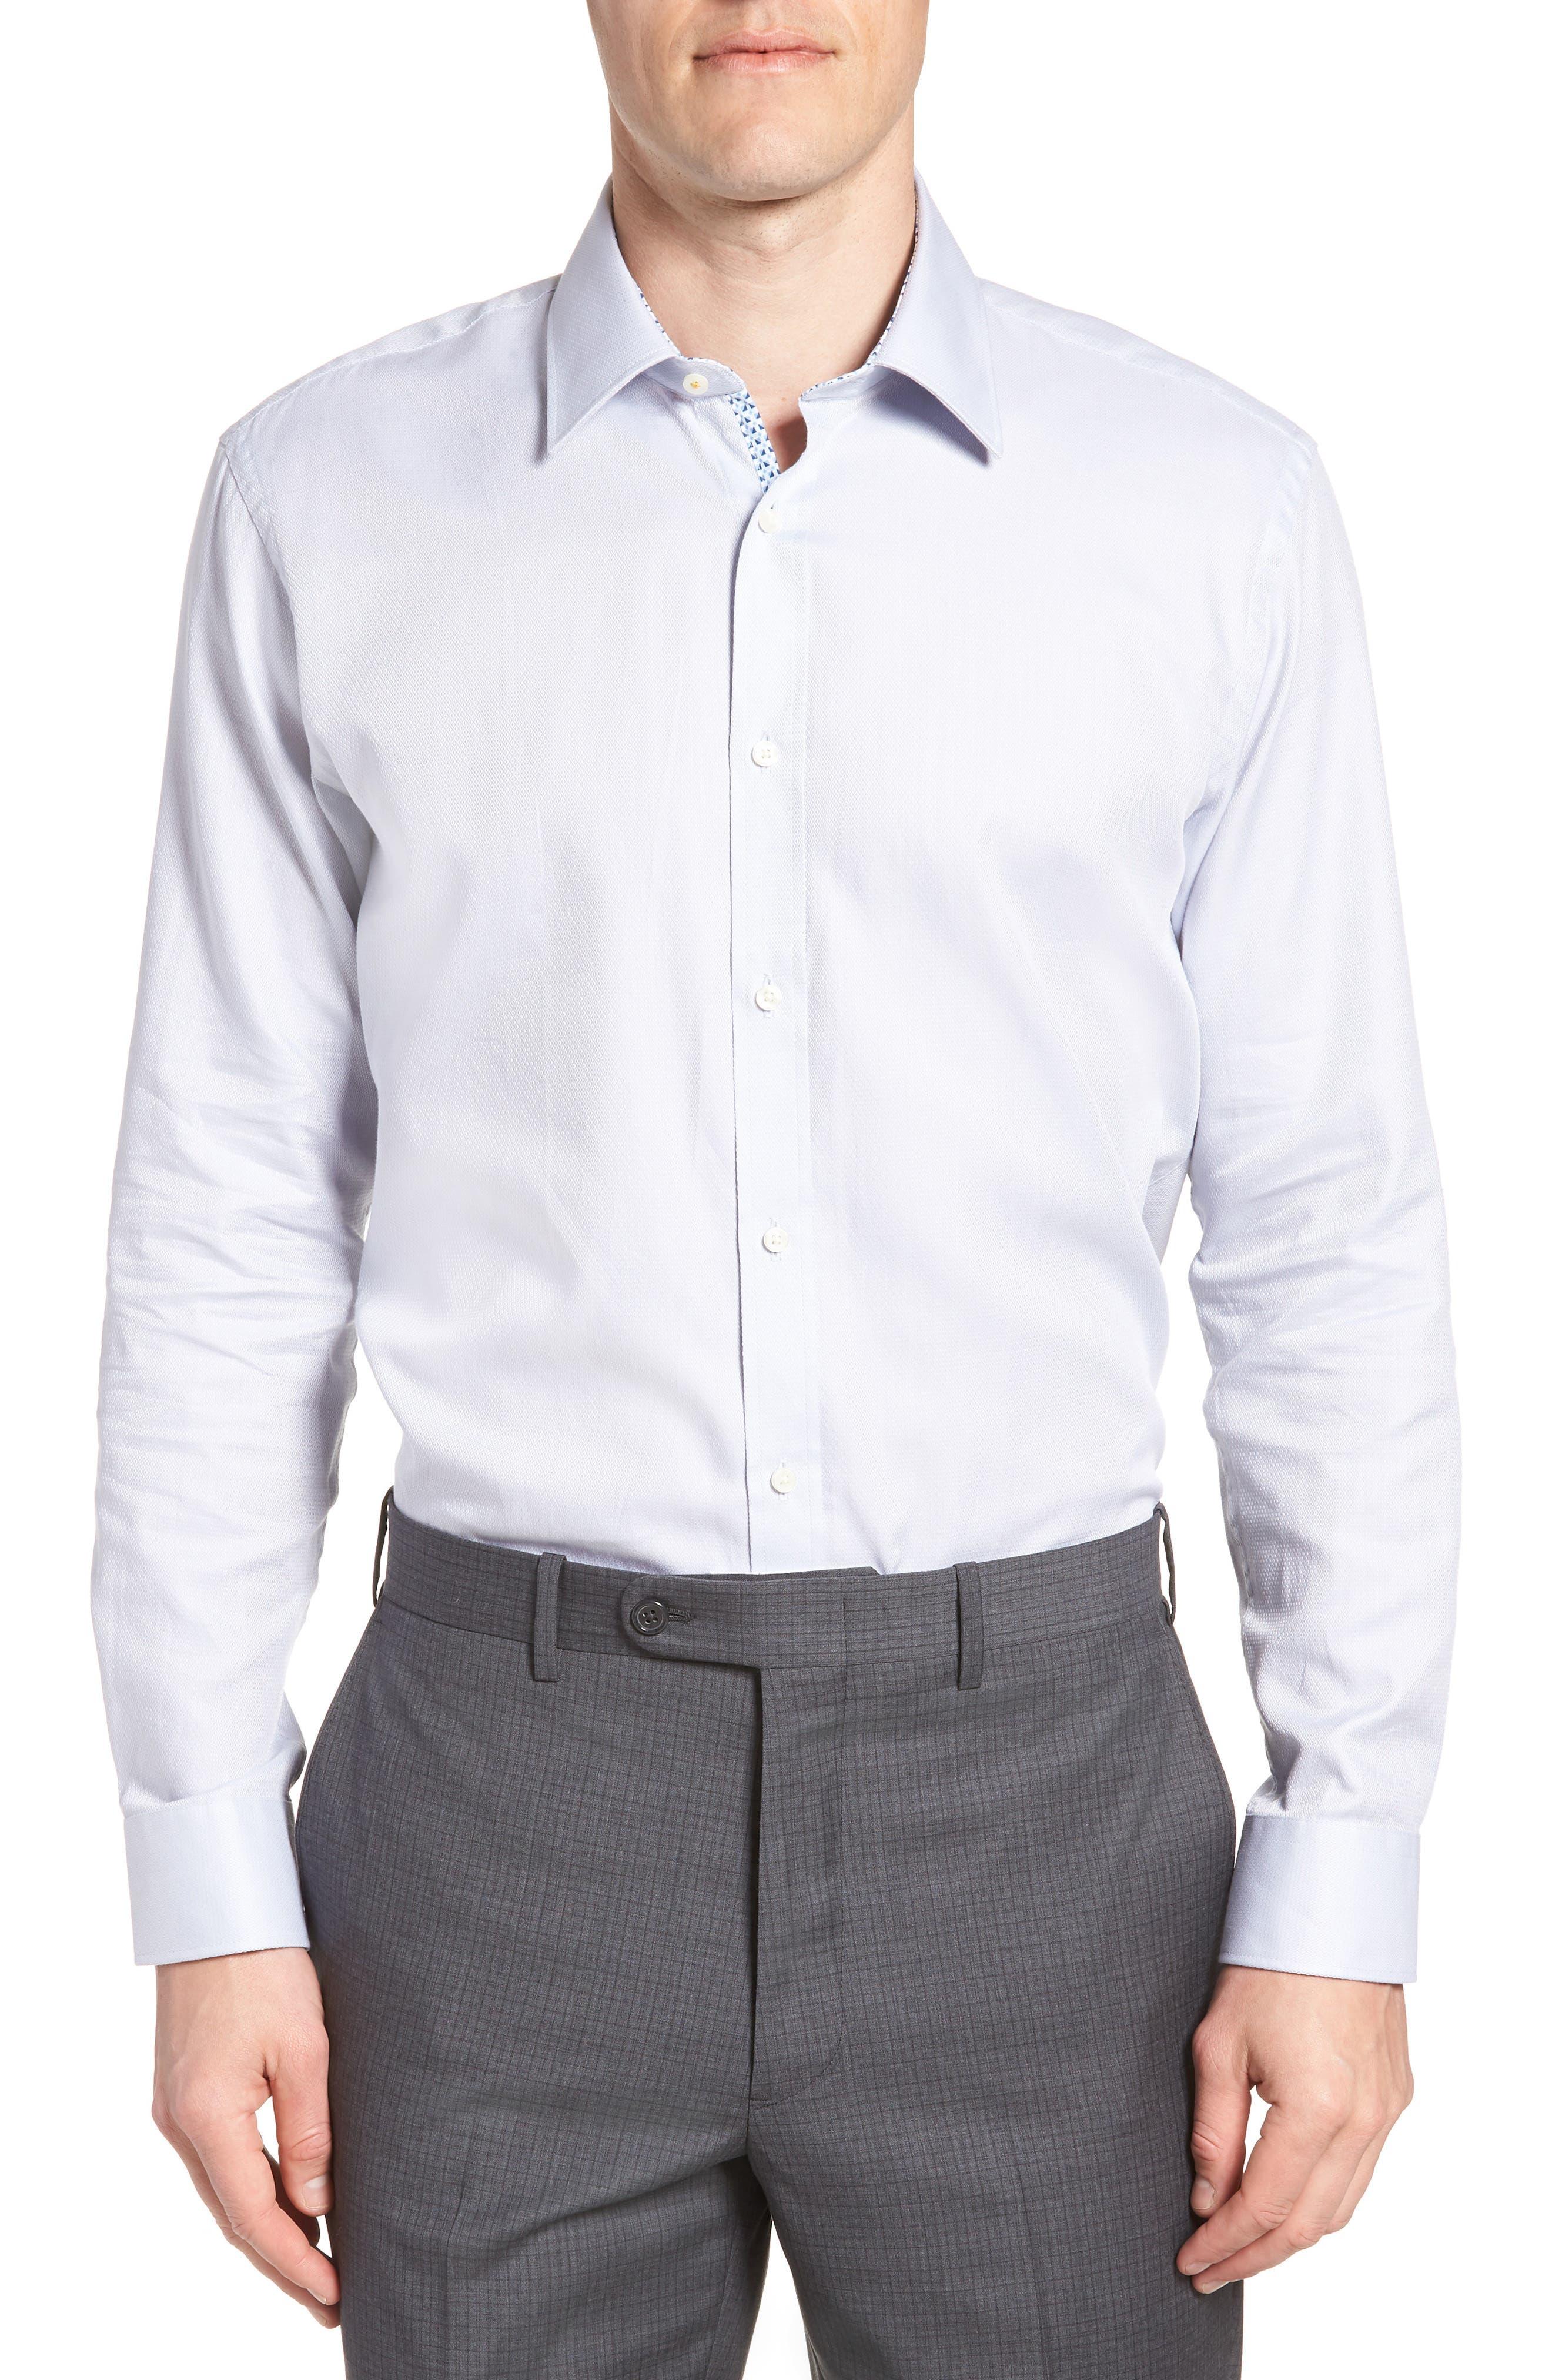 Ollyox Slim Fit Solid Dress Shirt,                         Main,                         color, GREY